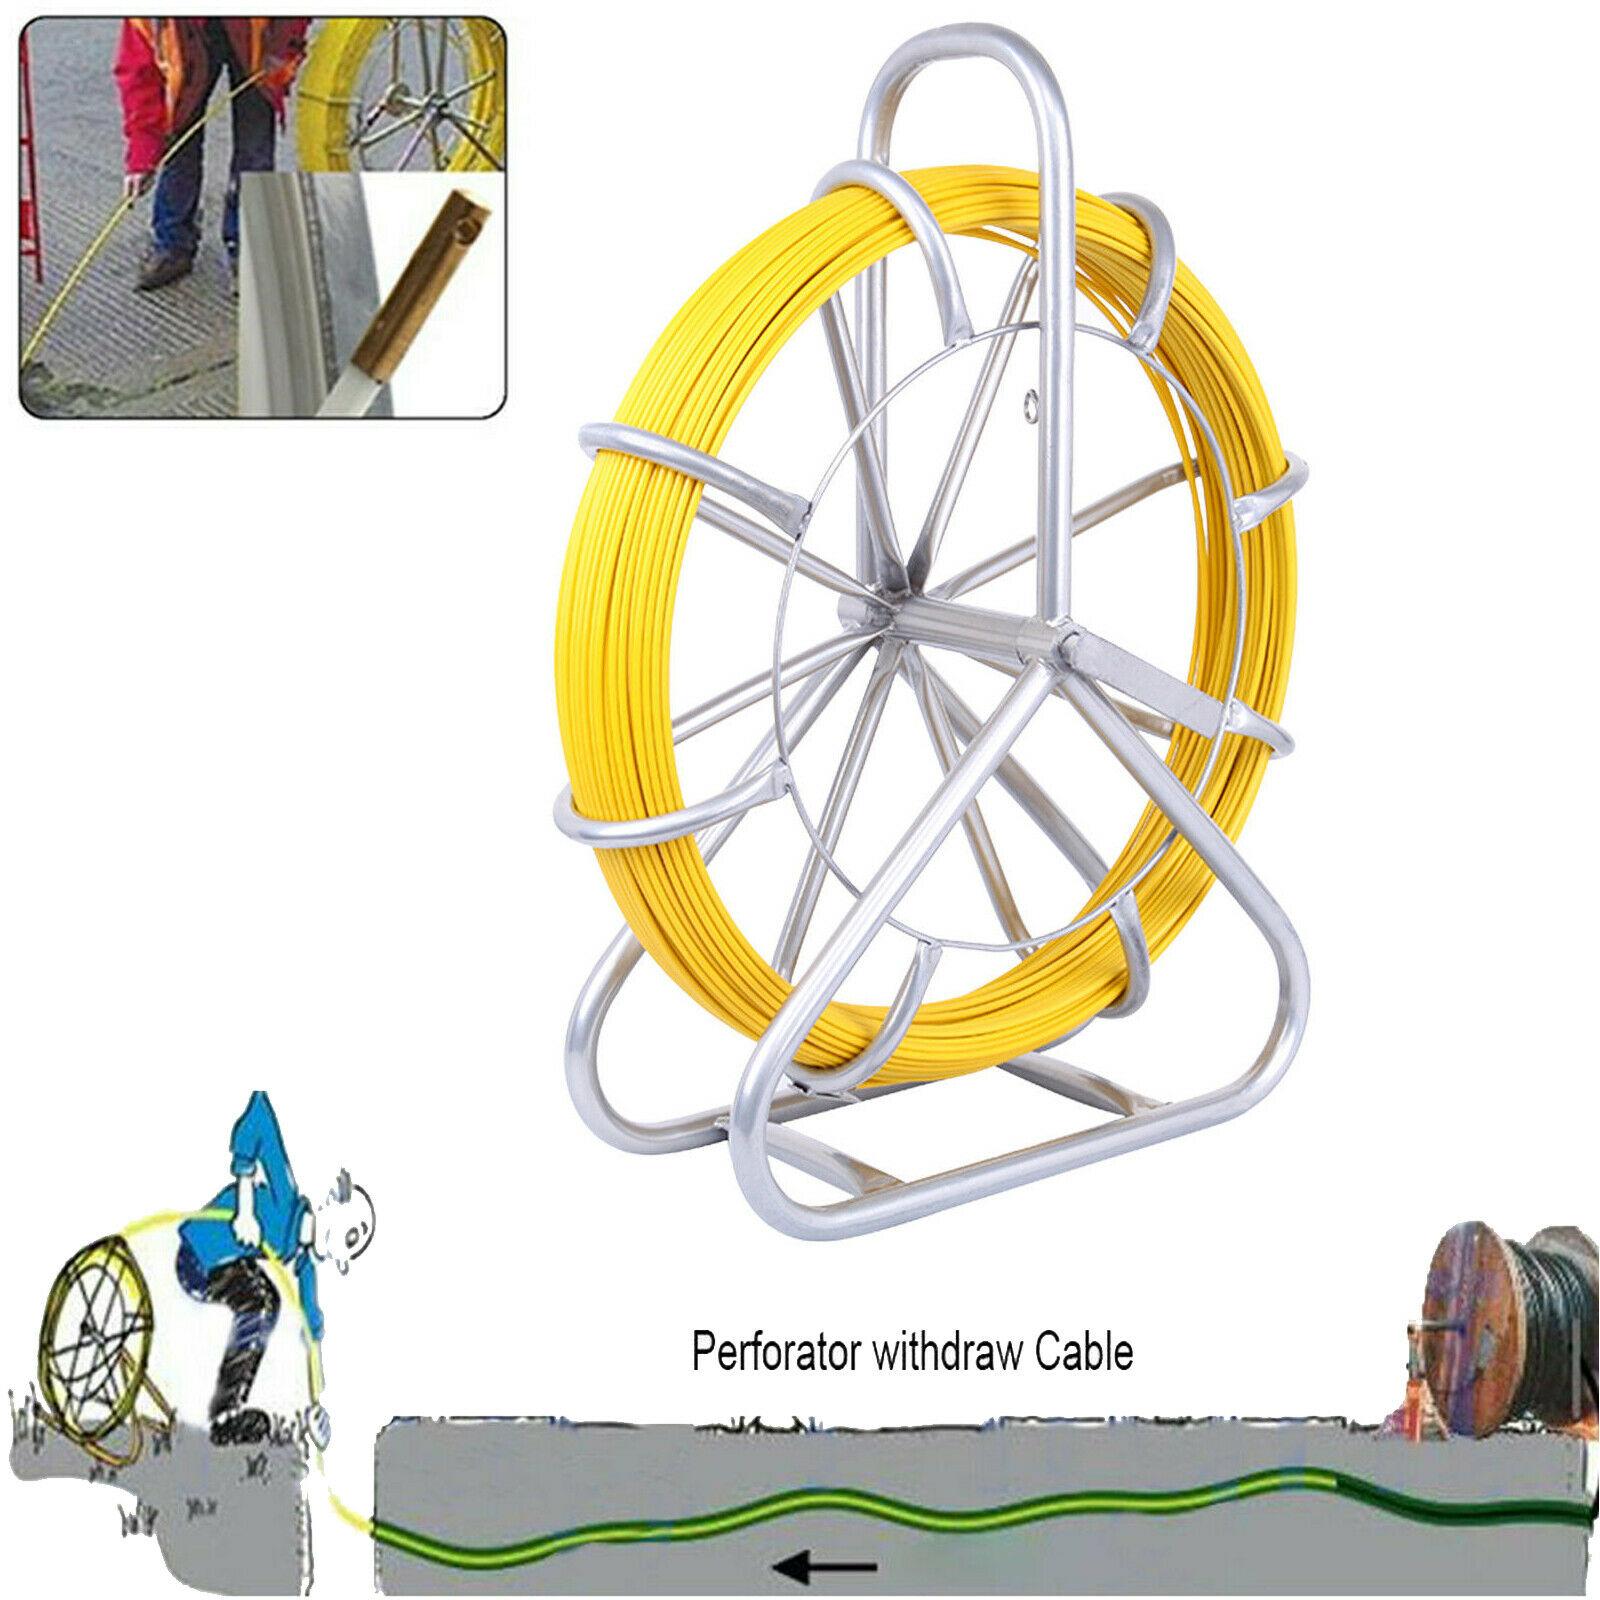 Yonntech-كابل الألياف الزجاجية ، 6 مللي متر ، 130 م ، قناة رود ، سحب كهربائي